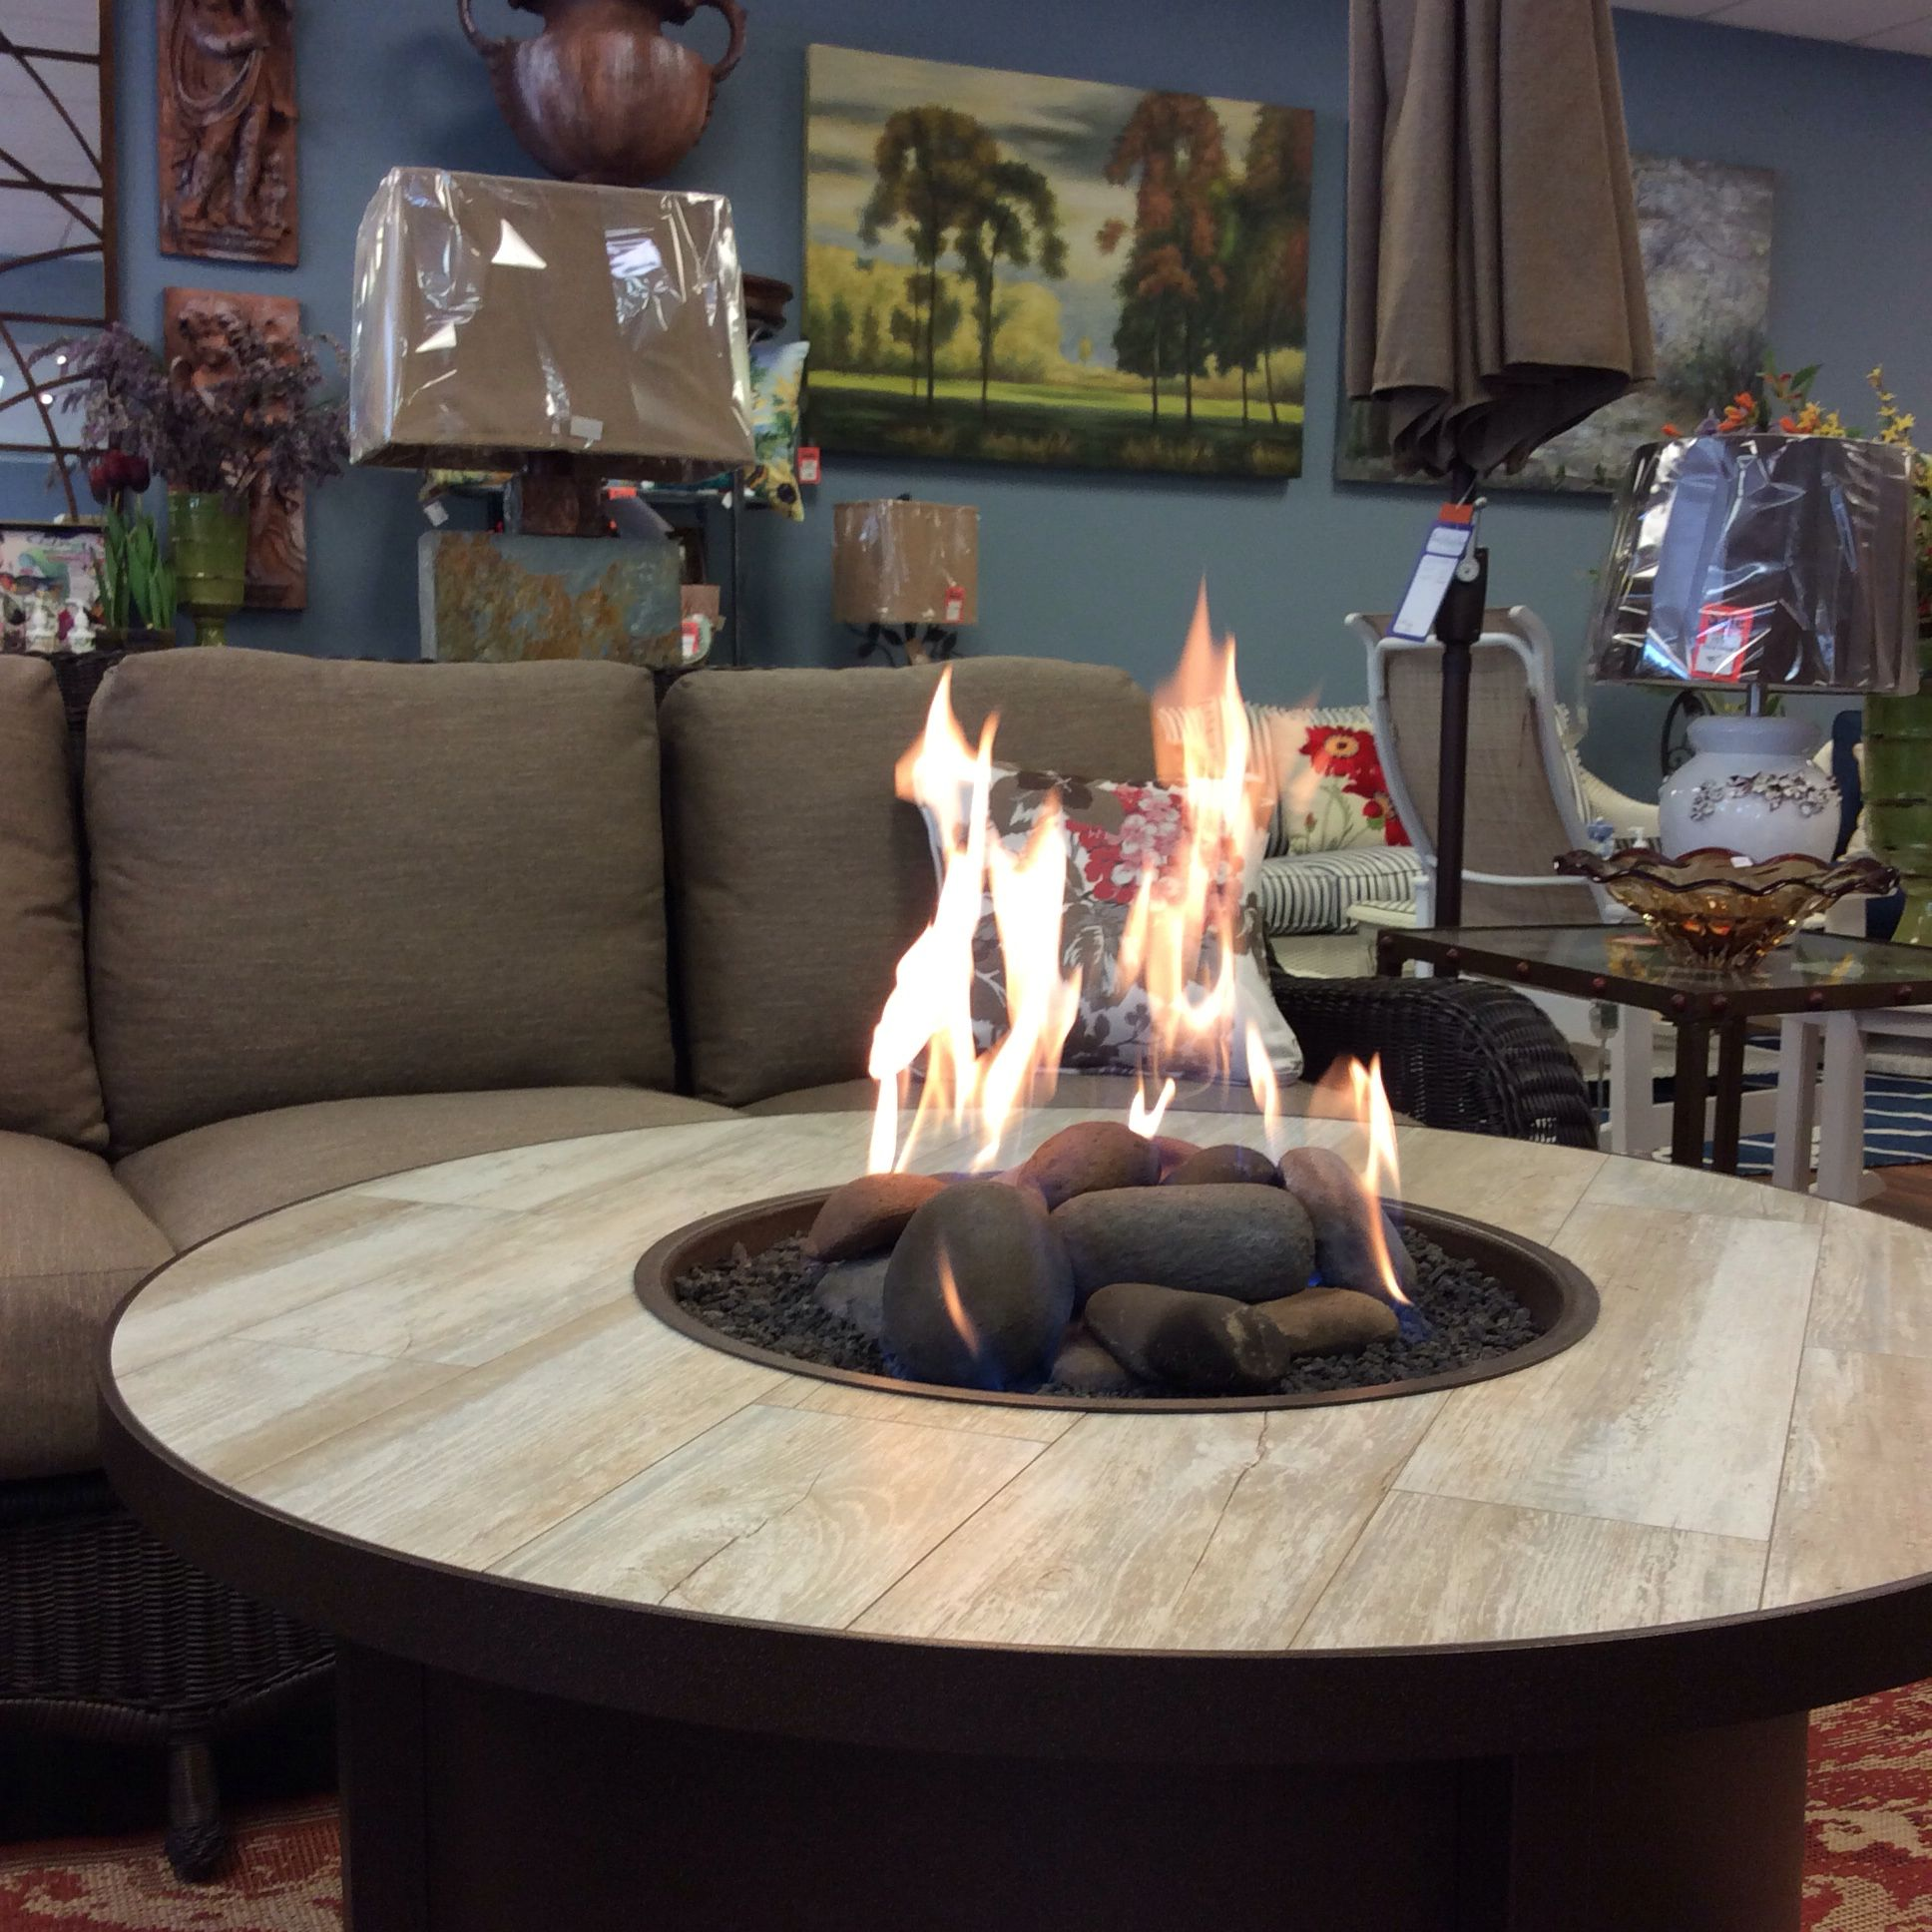 ow lee 42 santorini fire pit ceramic river rock commercial grade